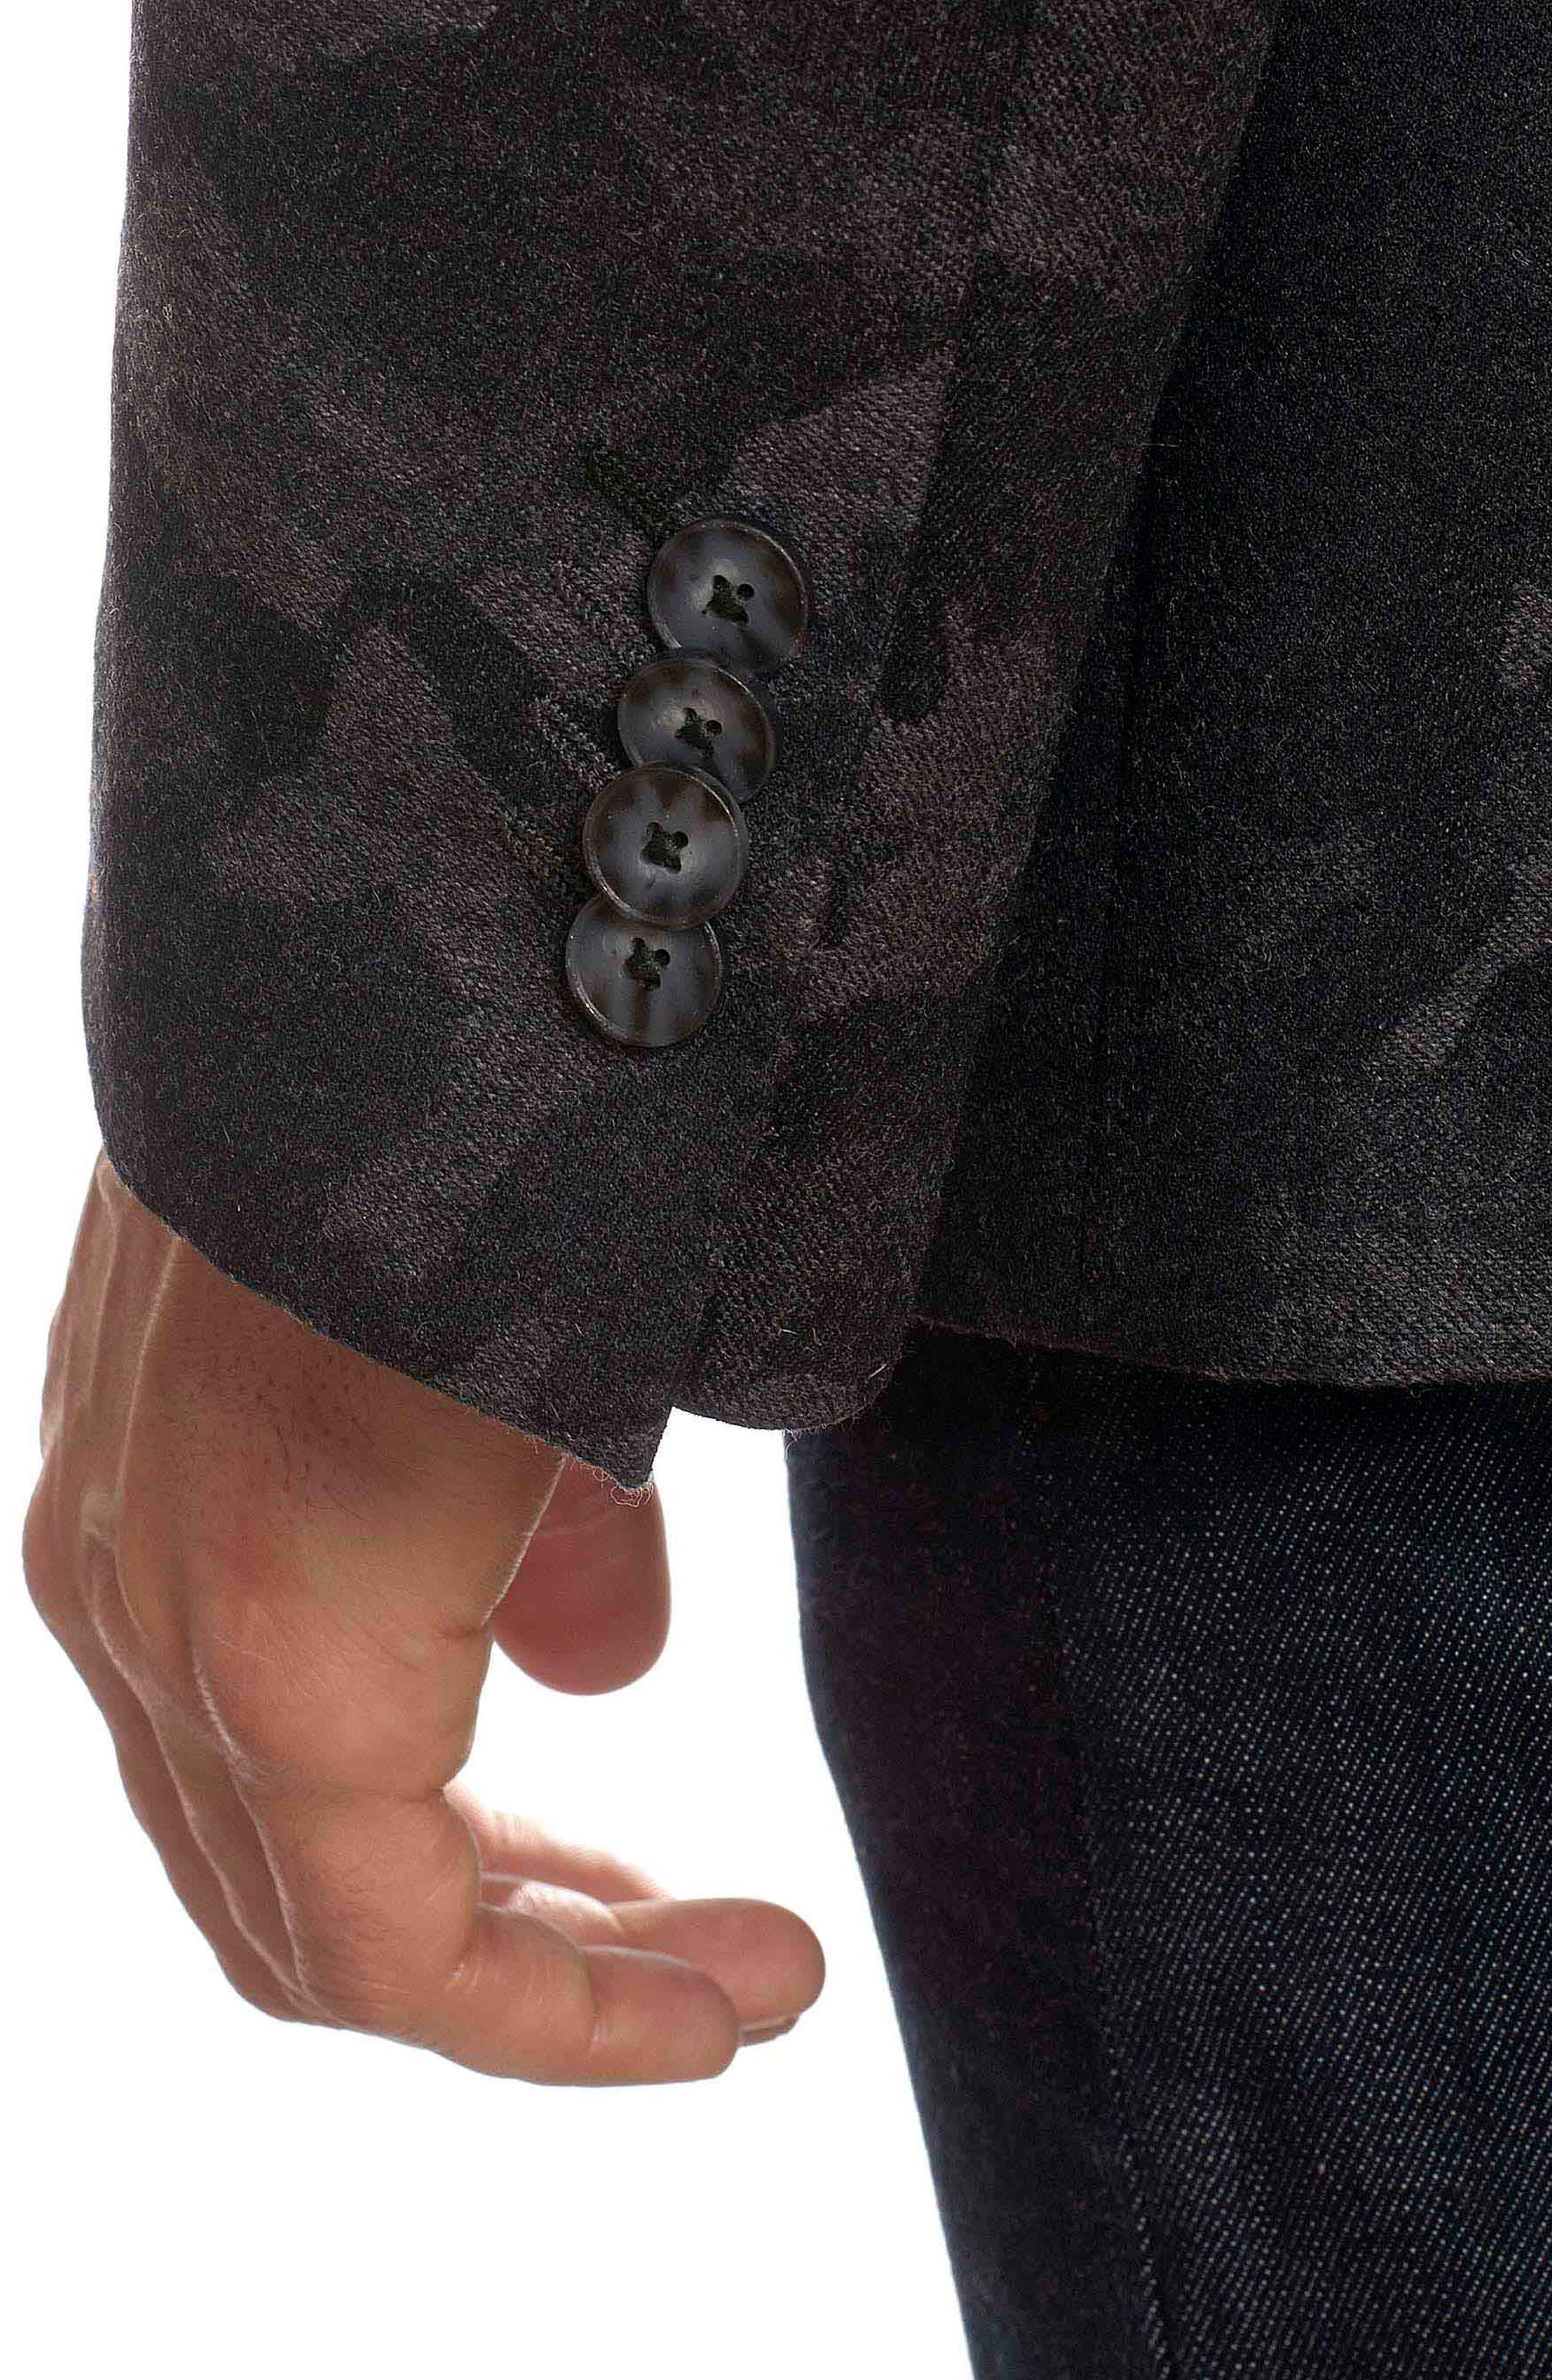 Portgain Classic Fit Sport Coat,                             Alternate thumbnail 3, color,                             Grey